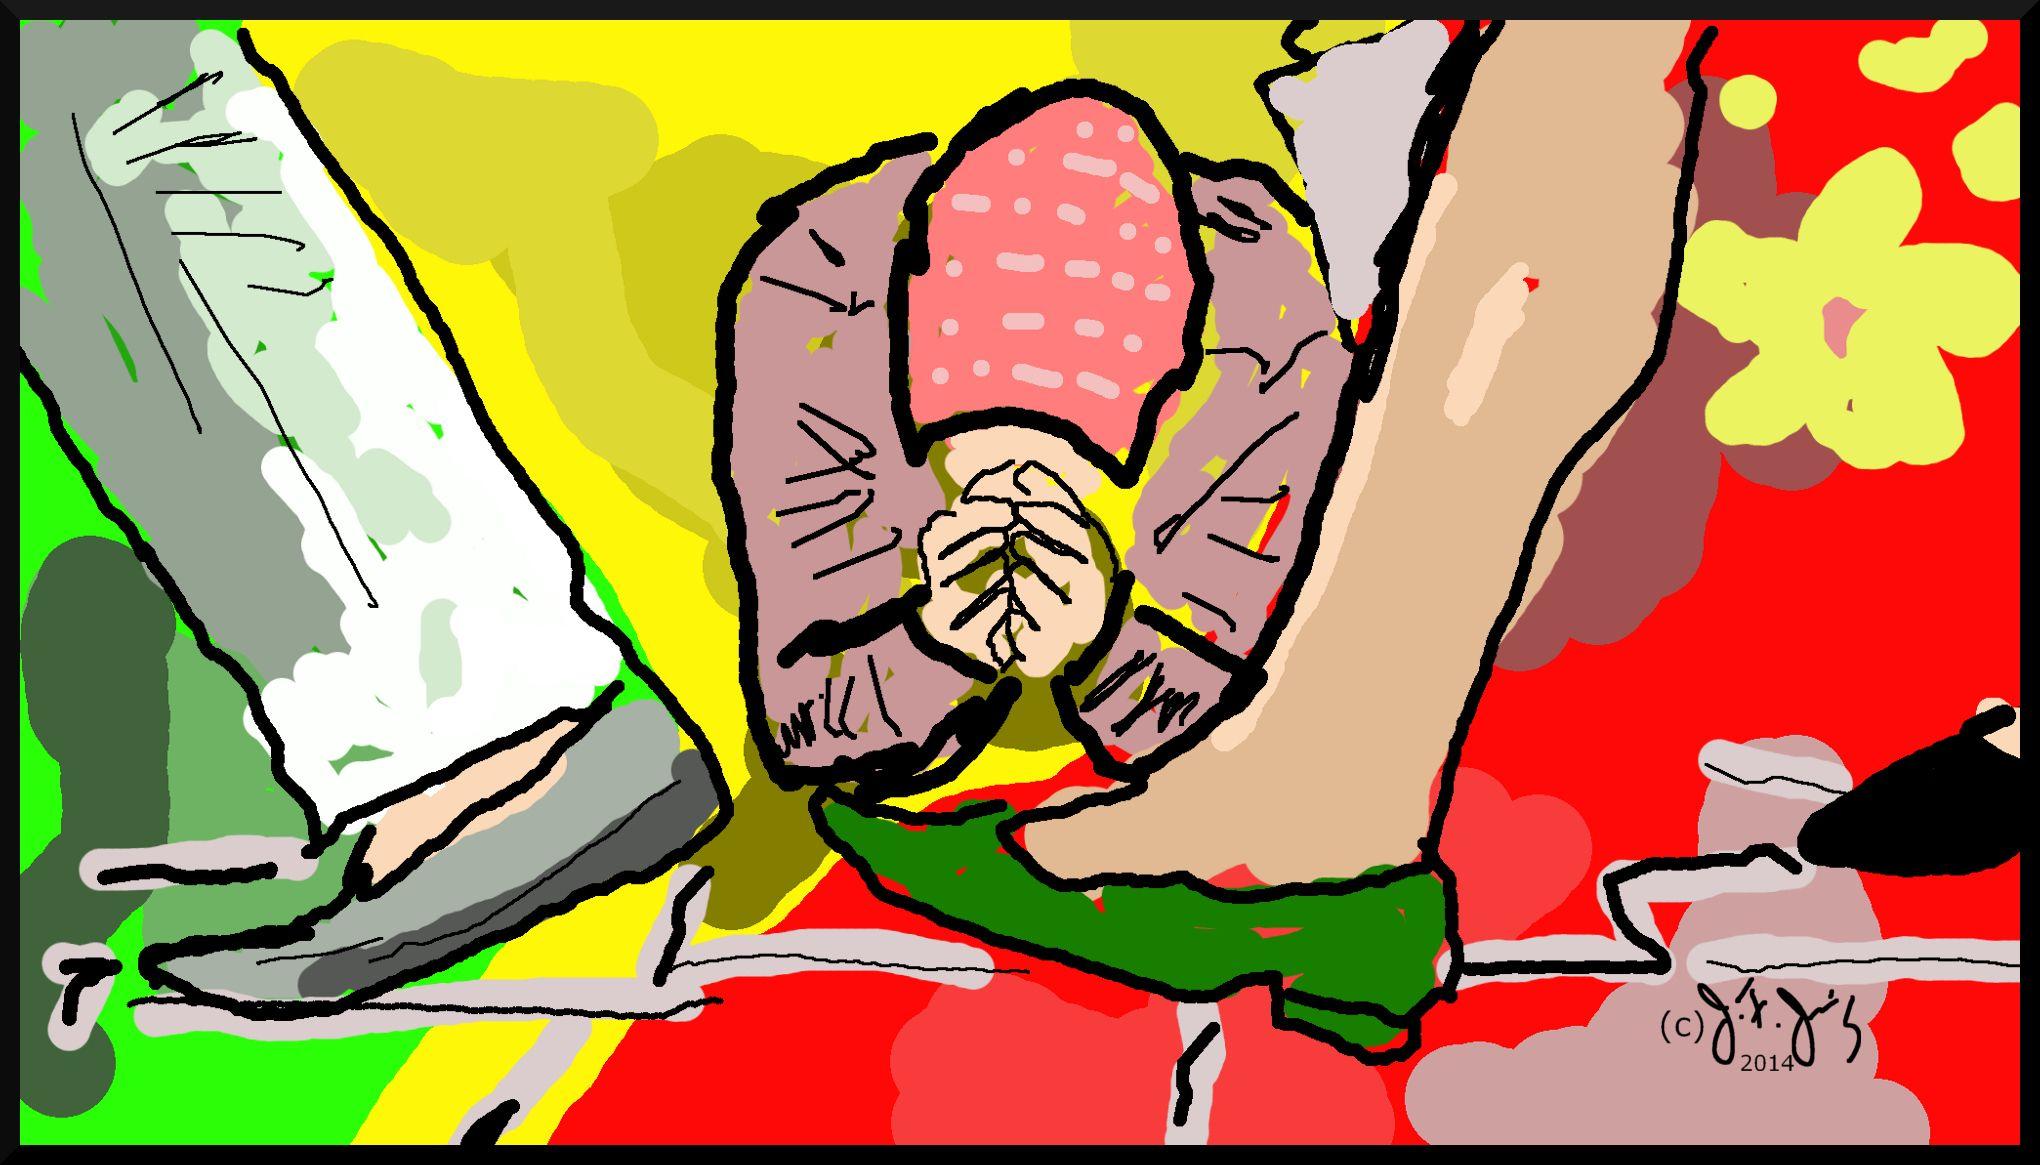 Prayers  By J. F. Jennings  2014 praying, old, woman, elderly, poor, desperate, seeking